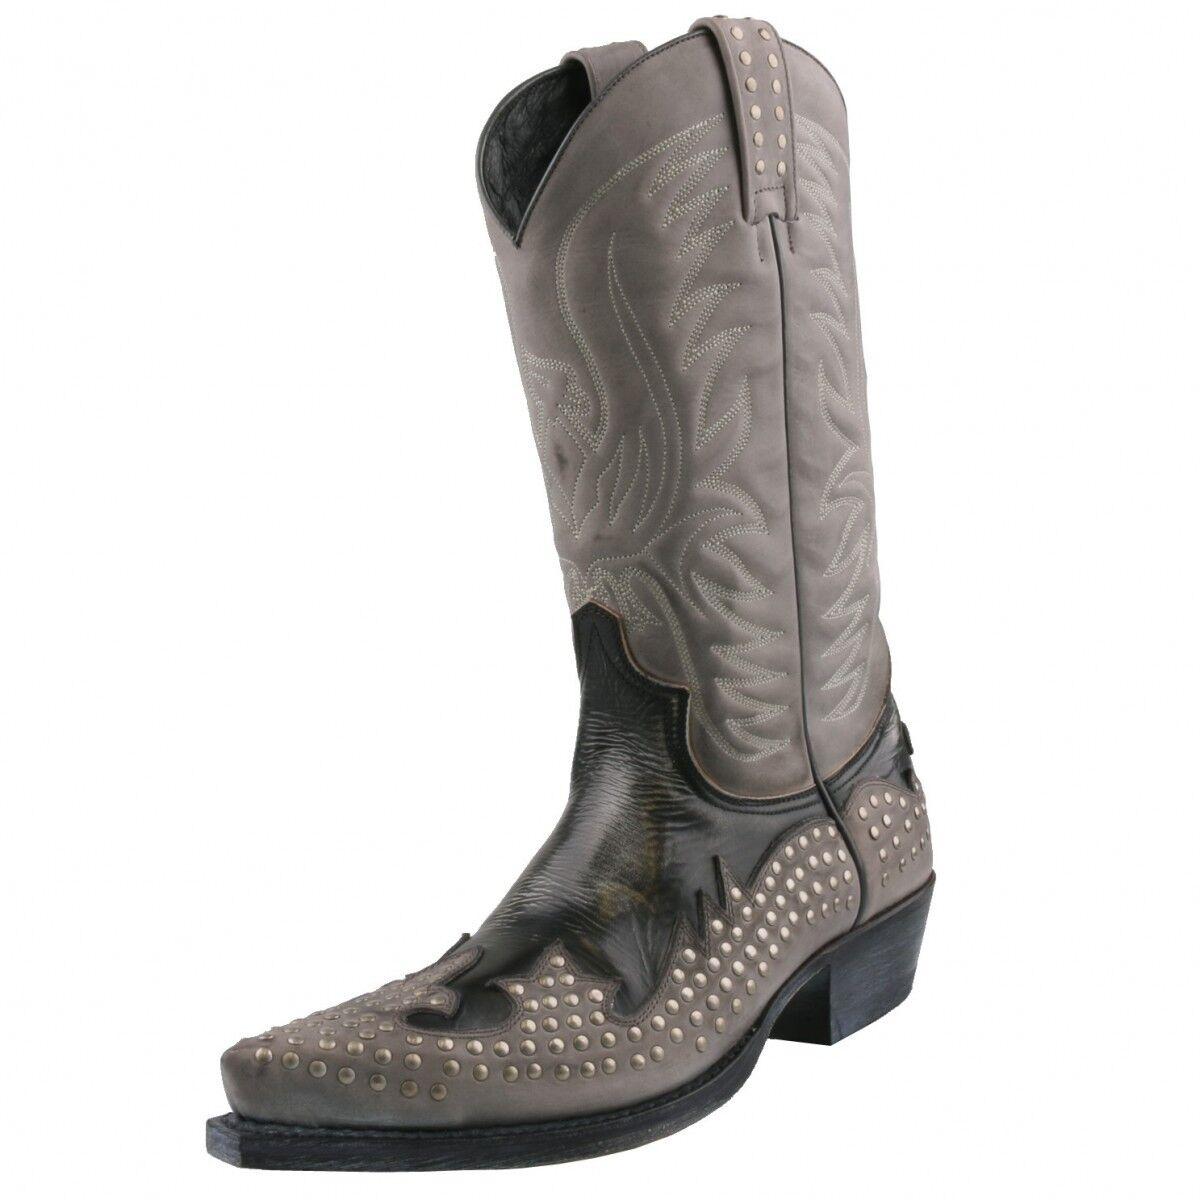 Neu Herrenstiefel SENDRA BOOTS Cowboystiefel Stiefelette Herrenstiefel Neu Stiefel Leder Schuhe 580855